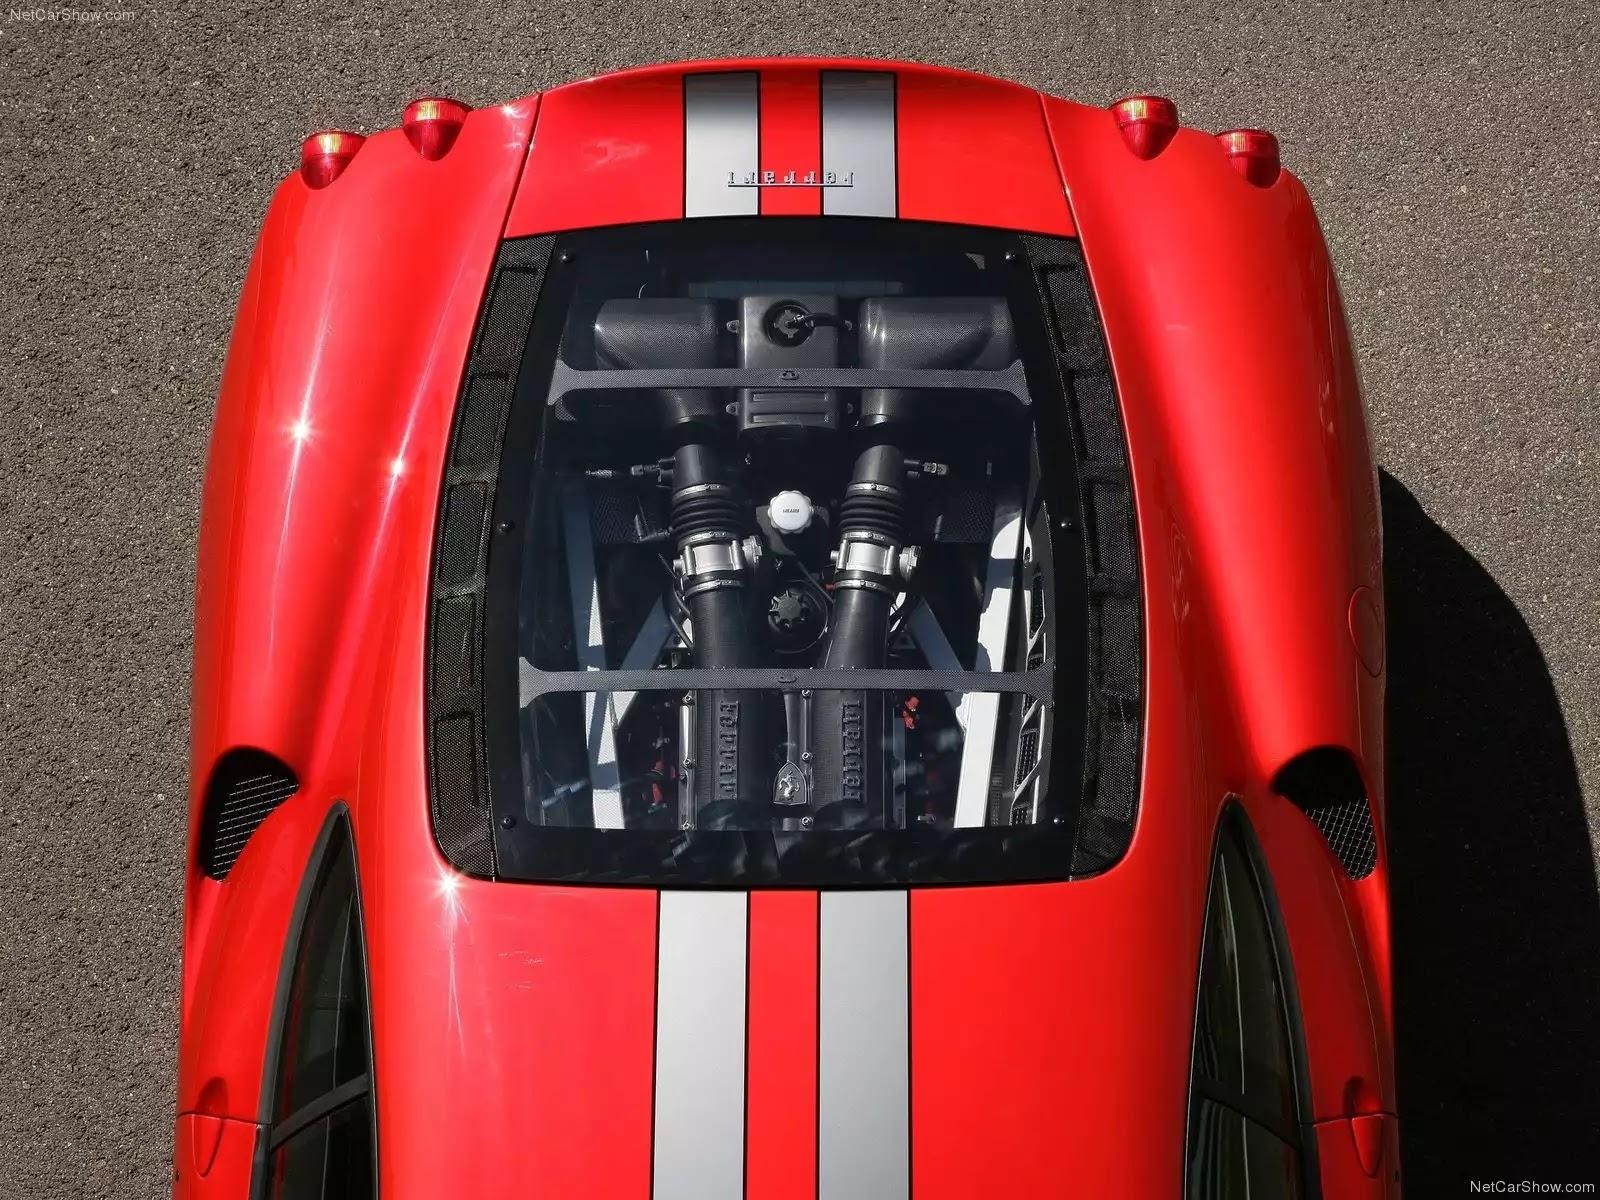 Hình ảnh siêu xe Ferrari 430 Scuderia 2008 & nội ngoại thất